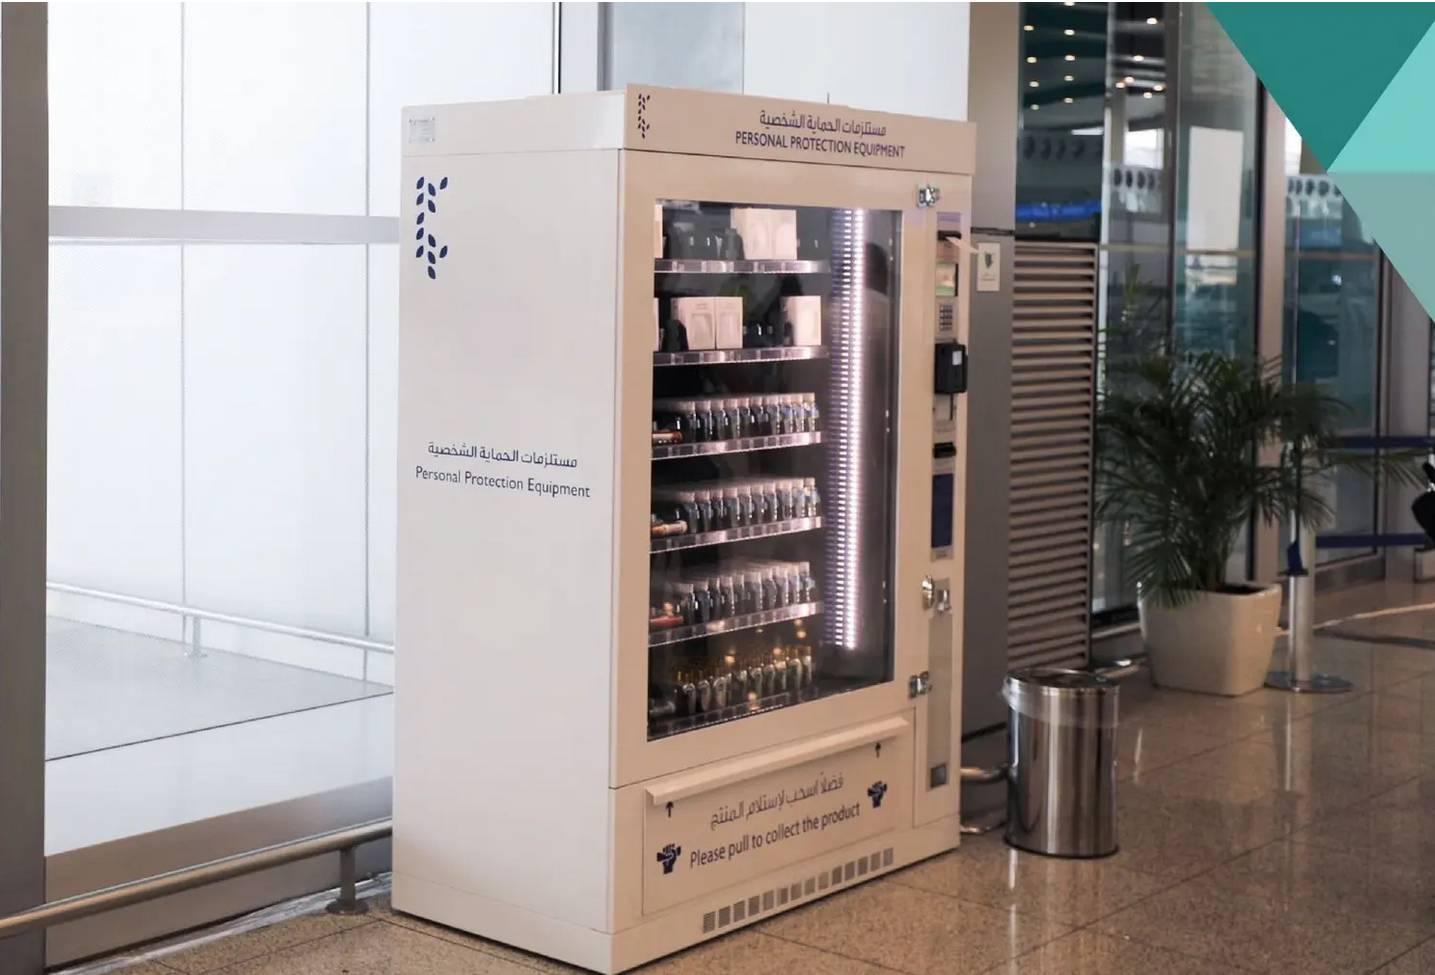 Riyadh airport installs PPE vending machines